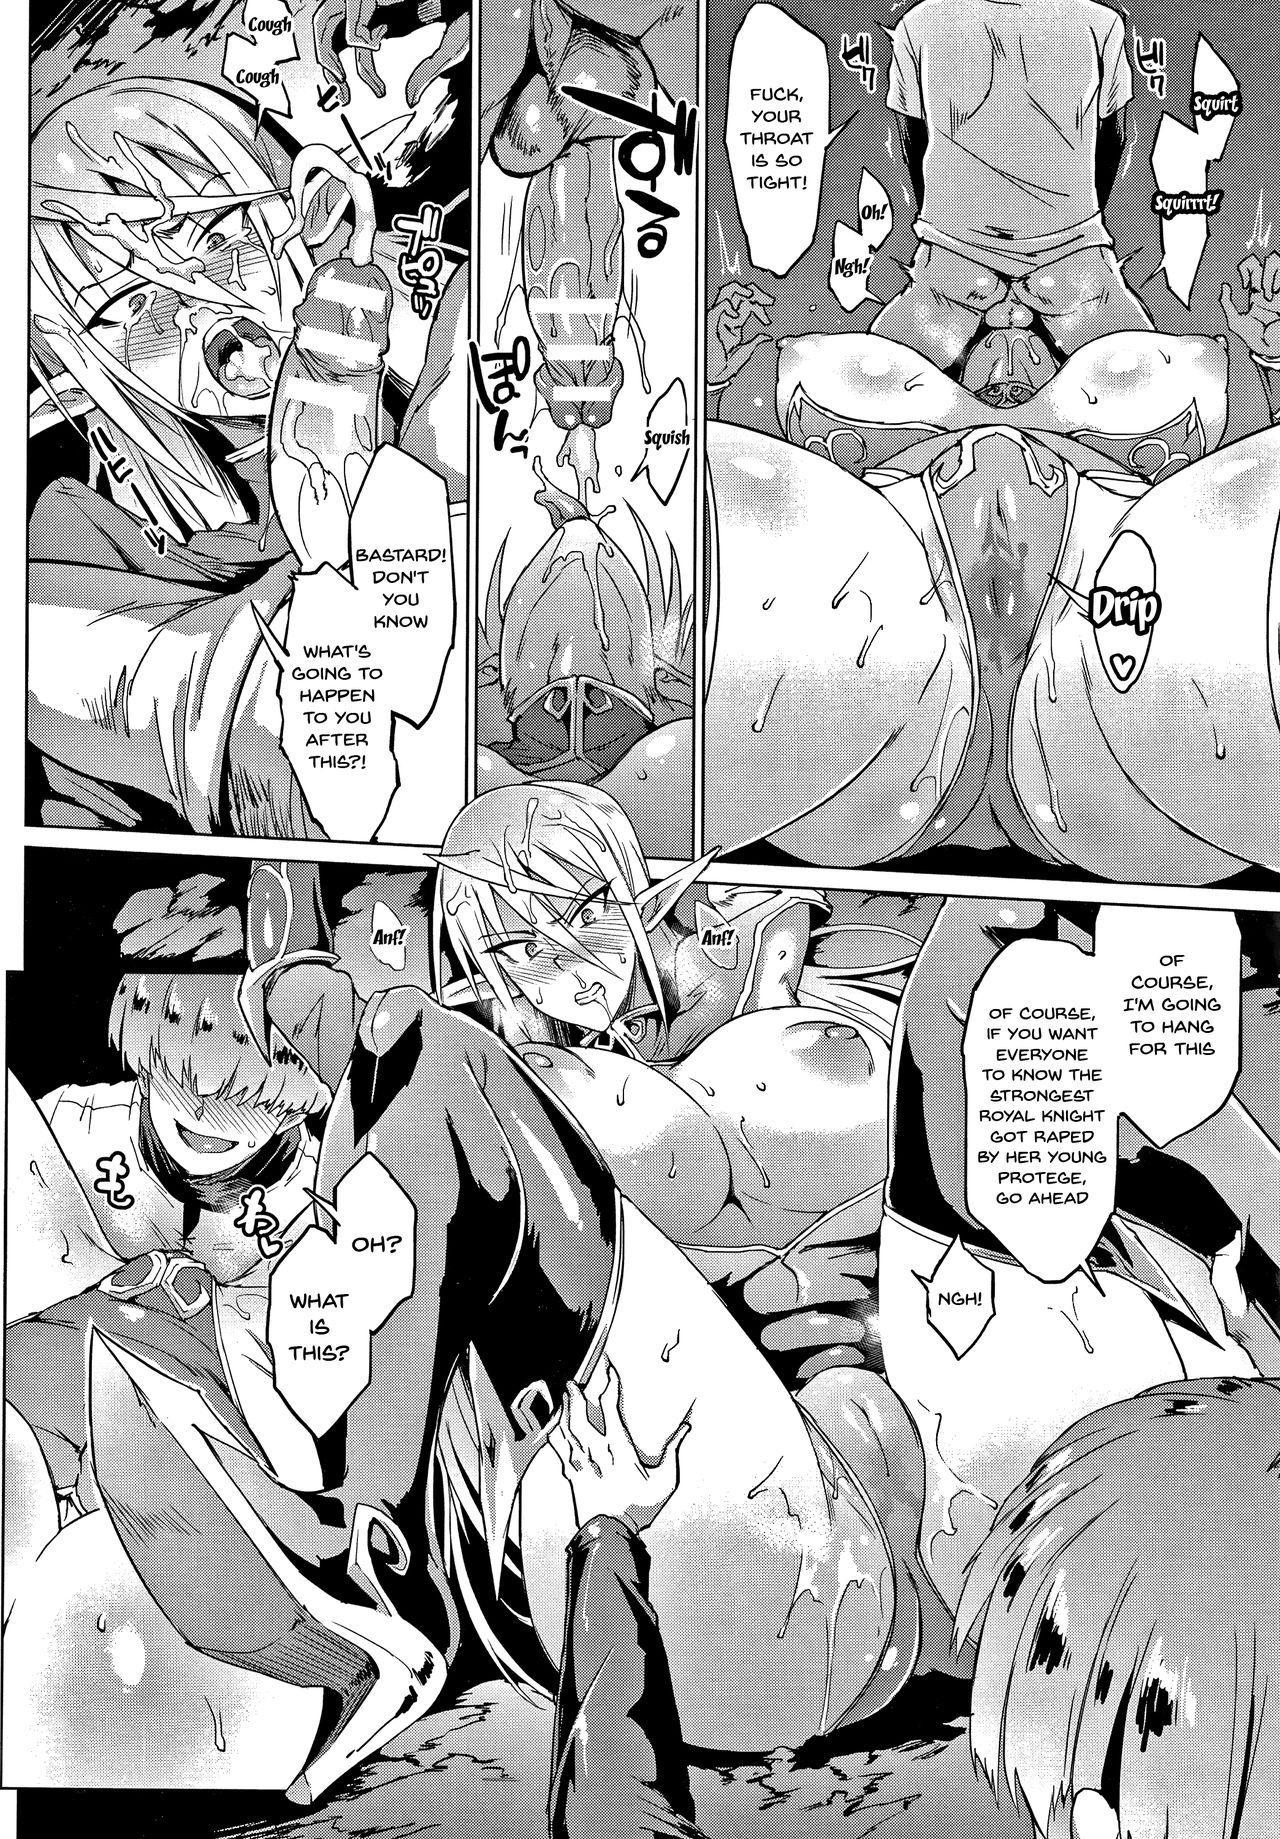 [Fan no Hitori] Sennen Reijou ~My Lady, My Master~  Ch.1-6 [English] {Doujins.com} 12